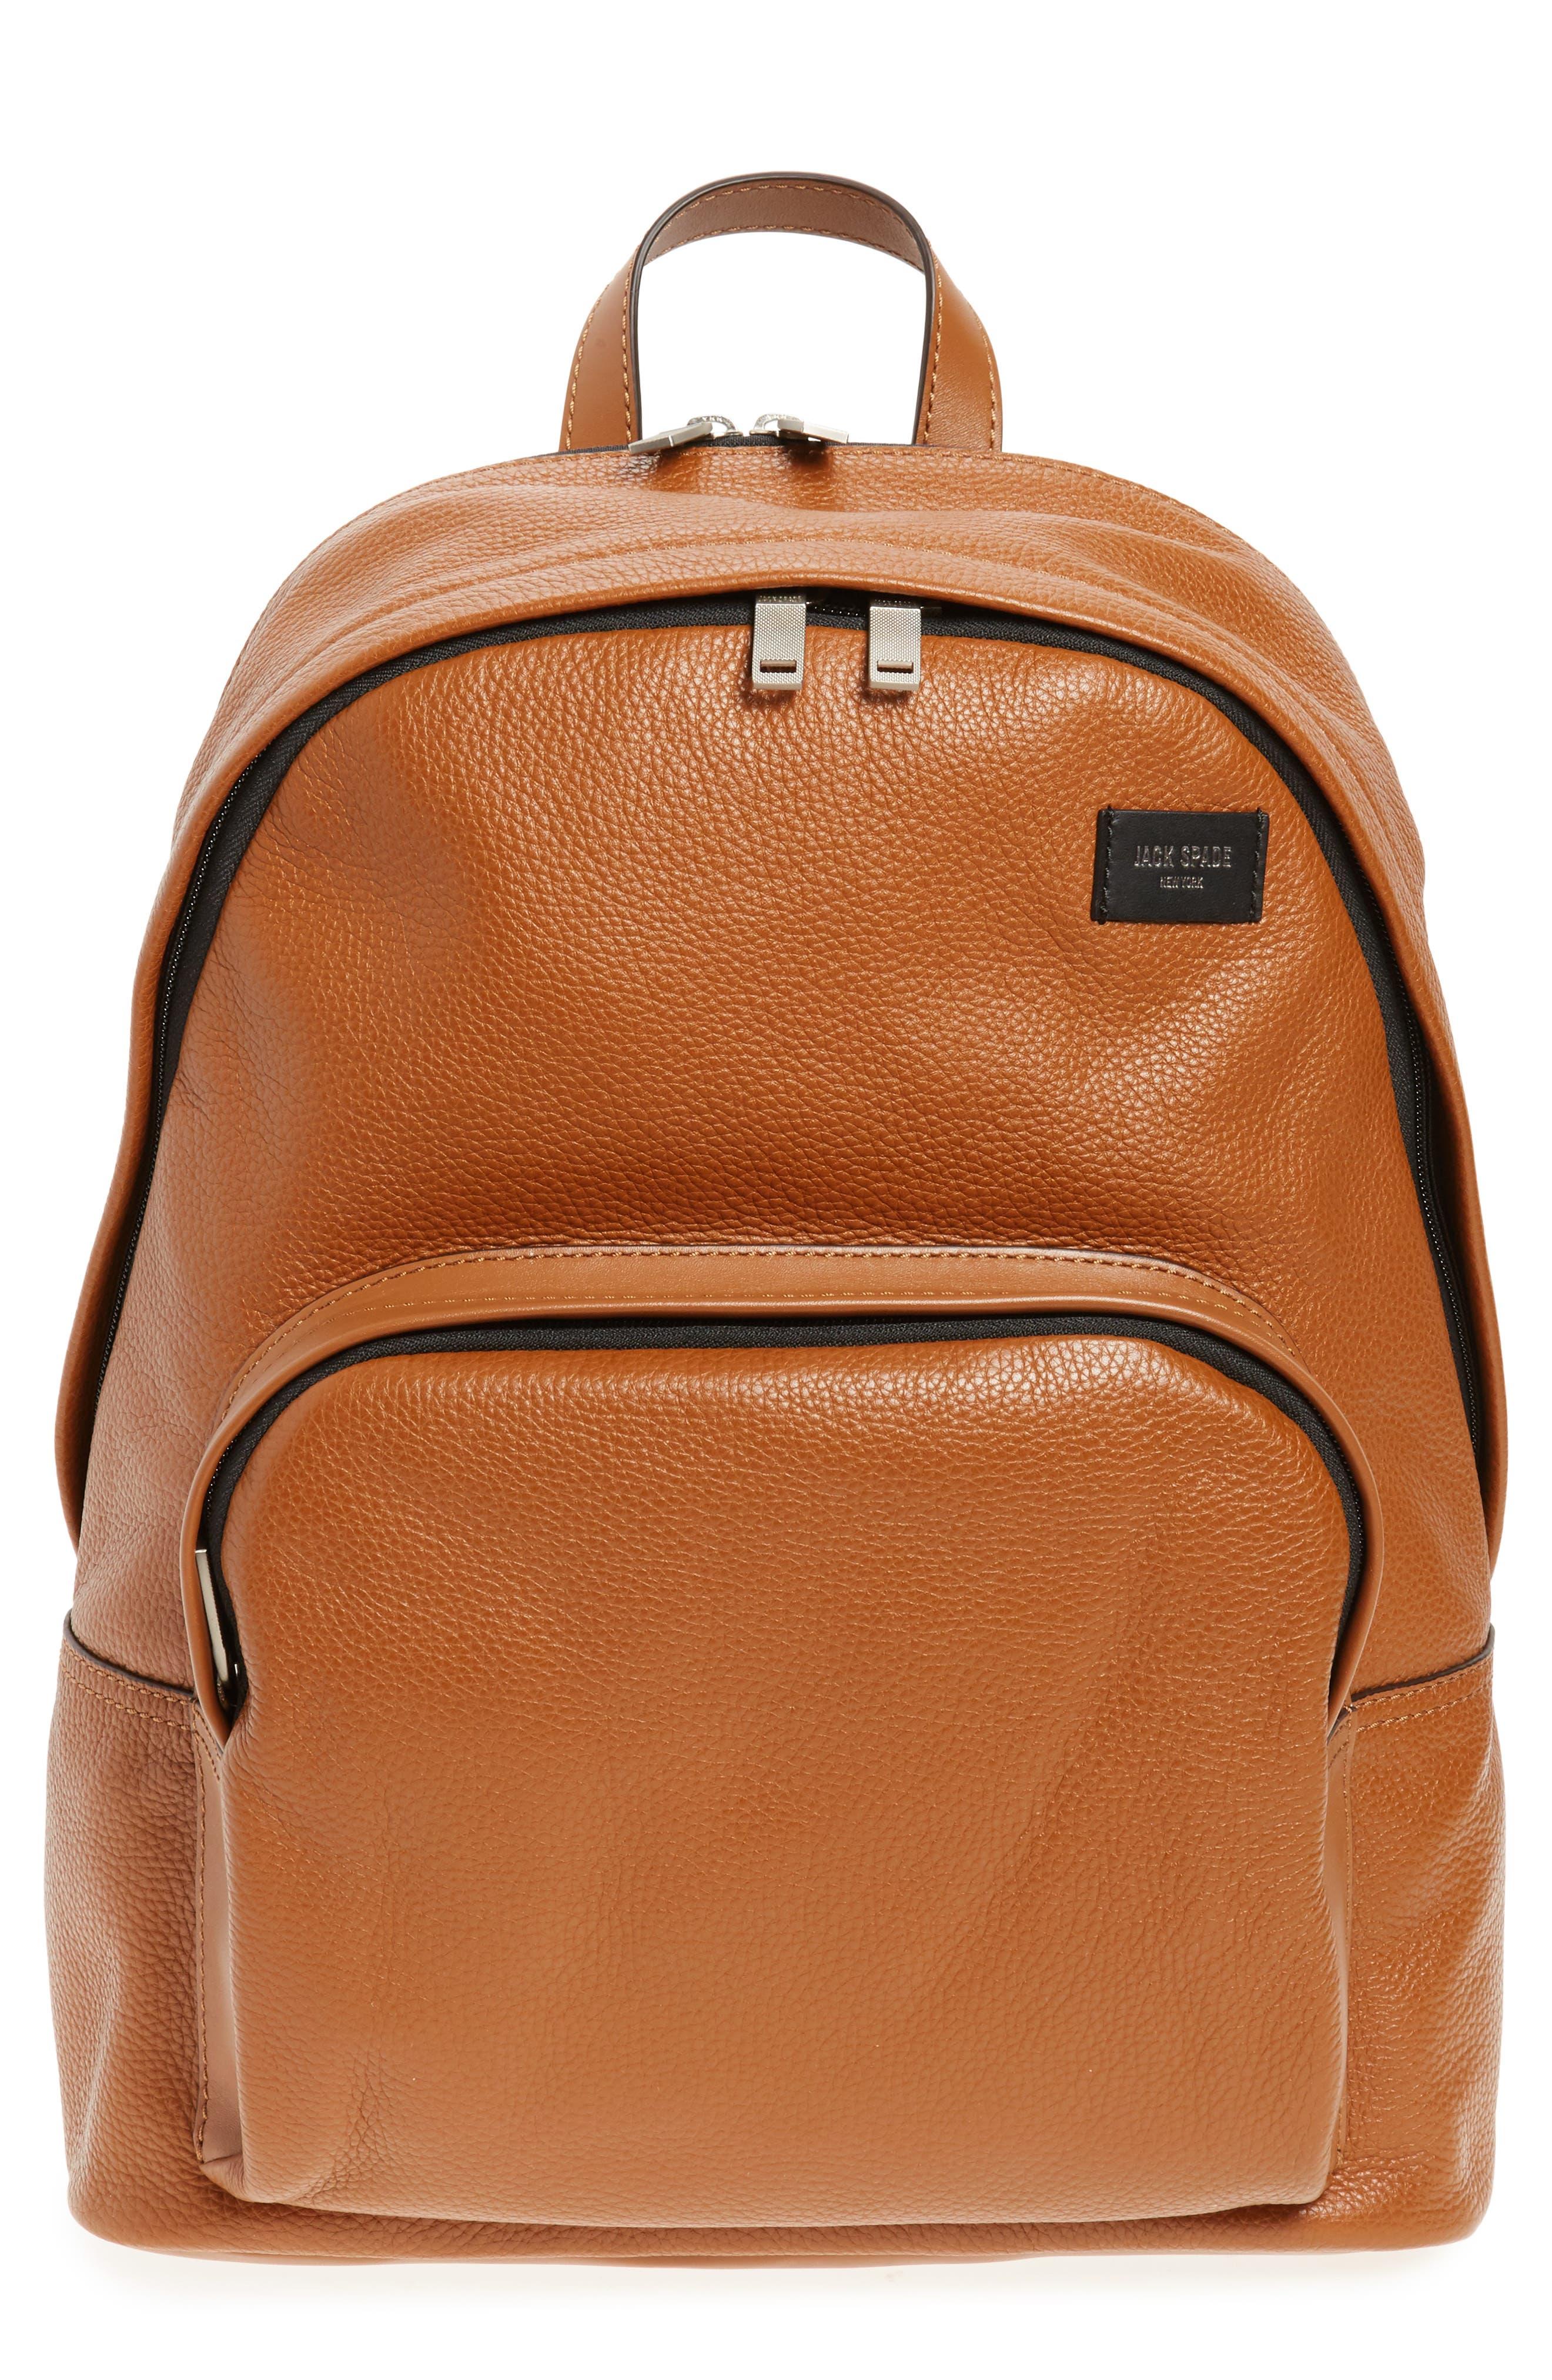 Main Image - Jack Spade Pebbled Leather Backpack